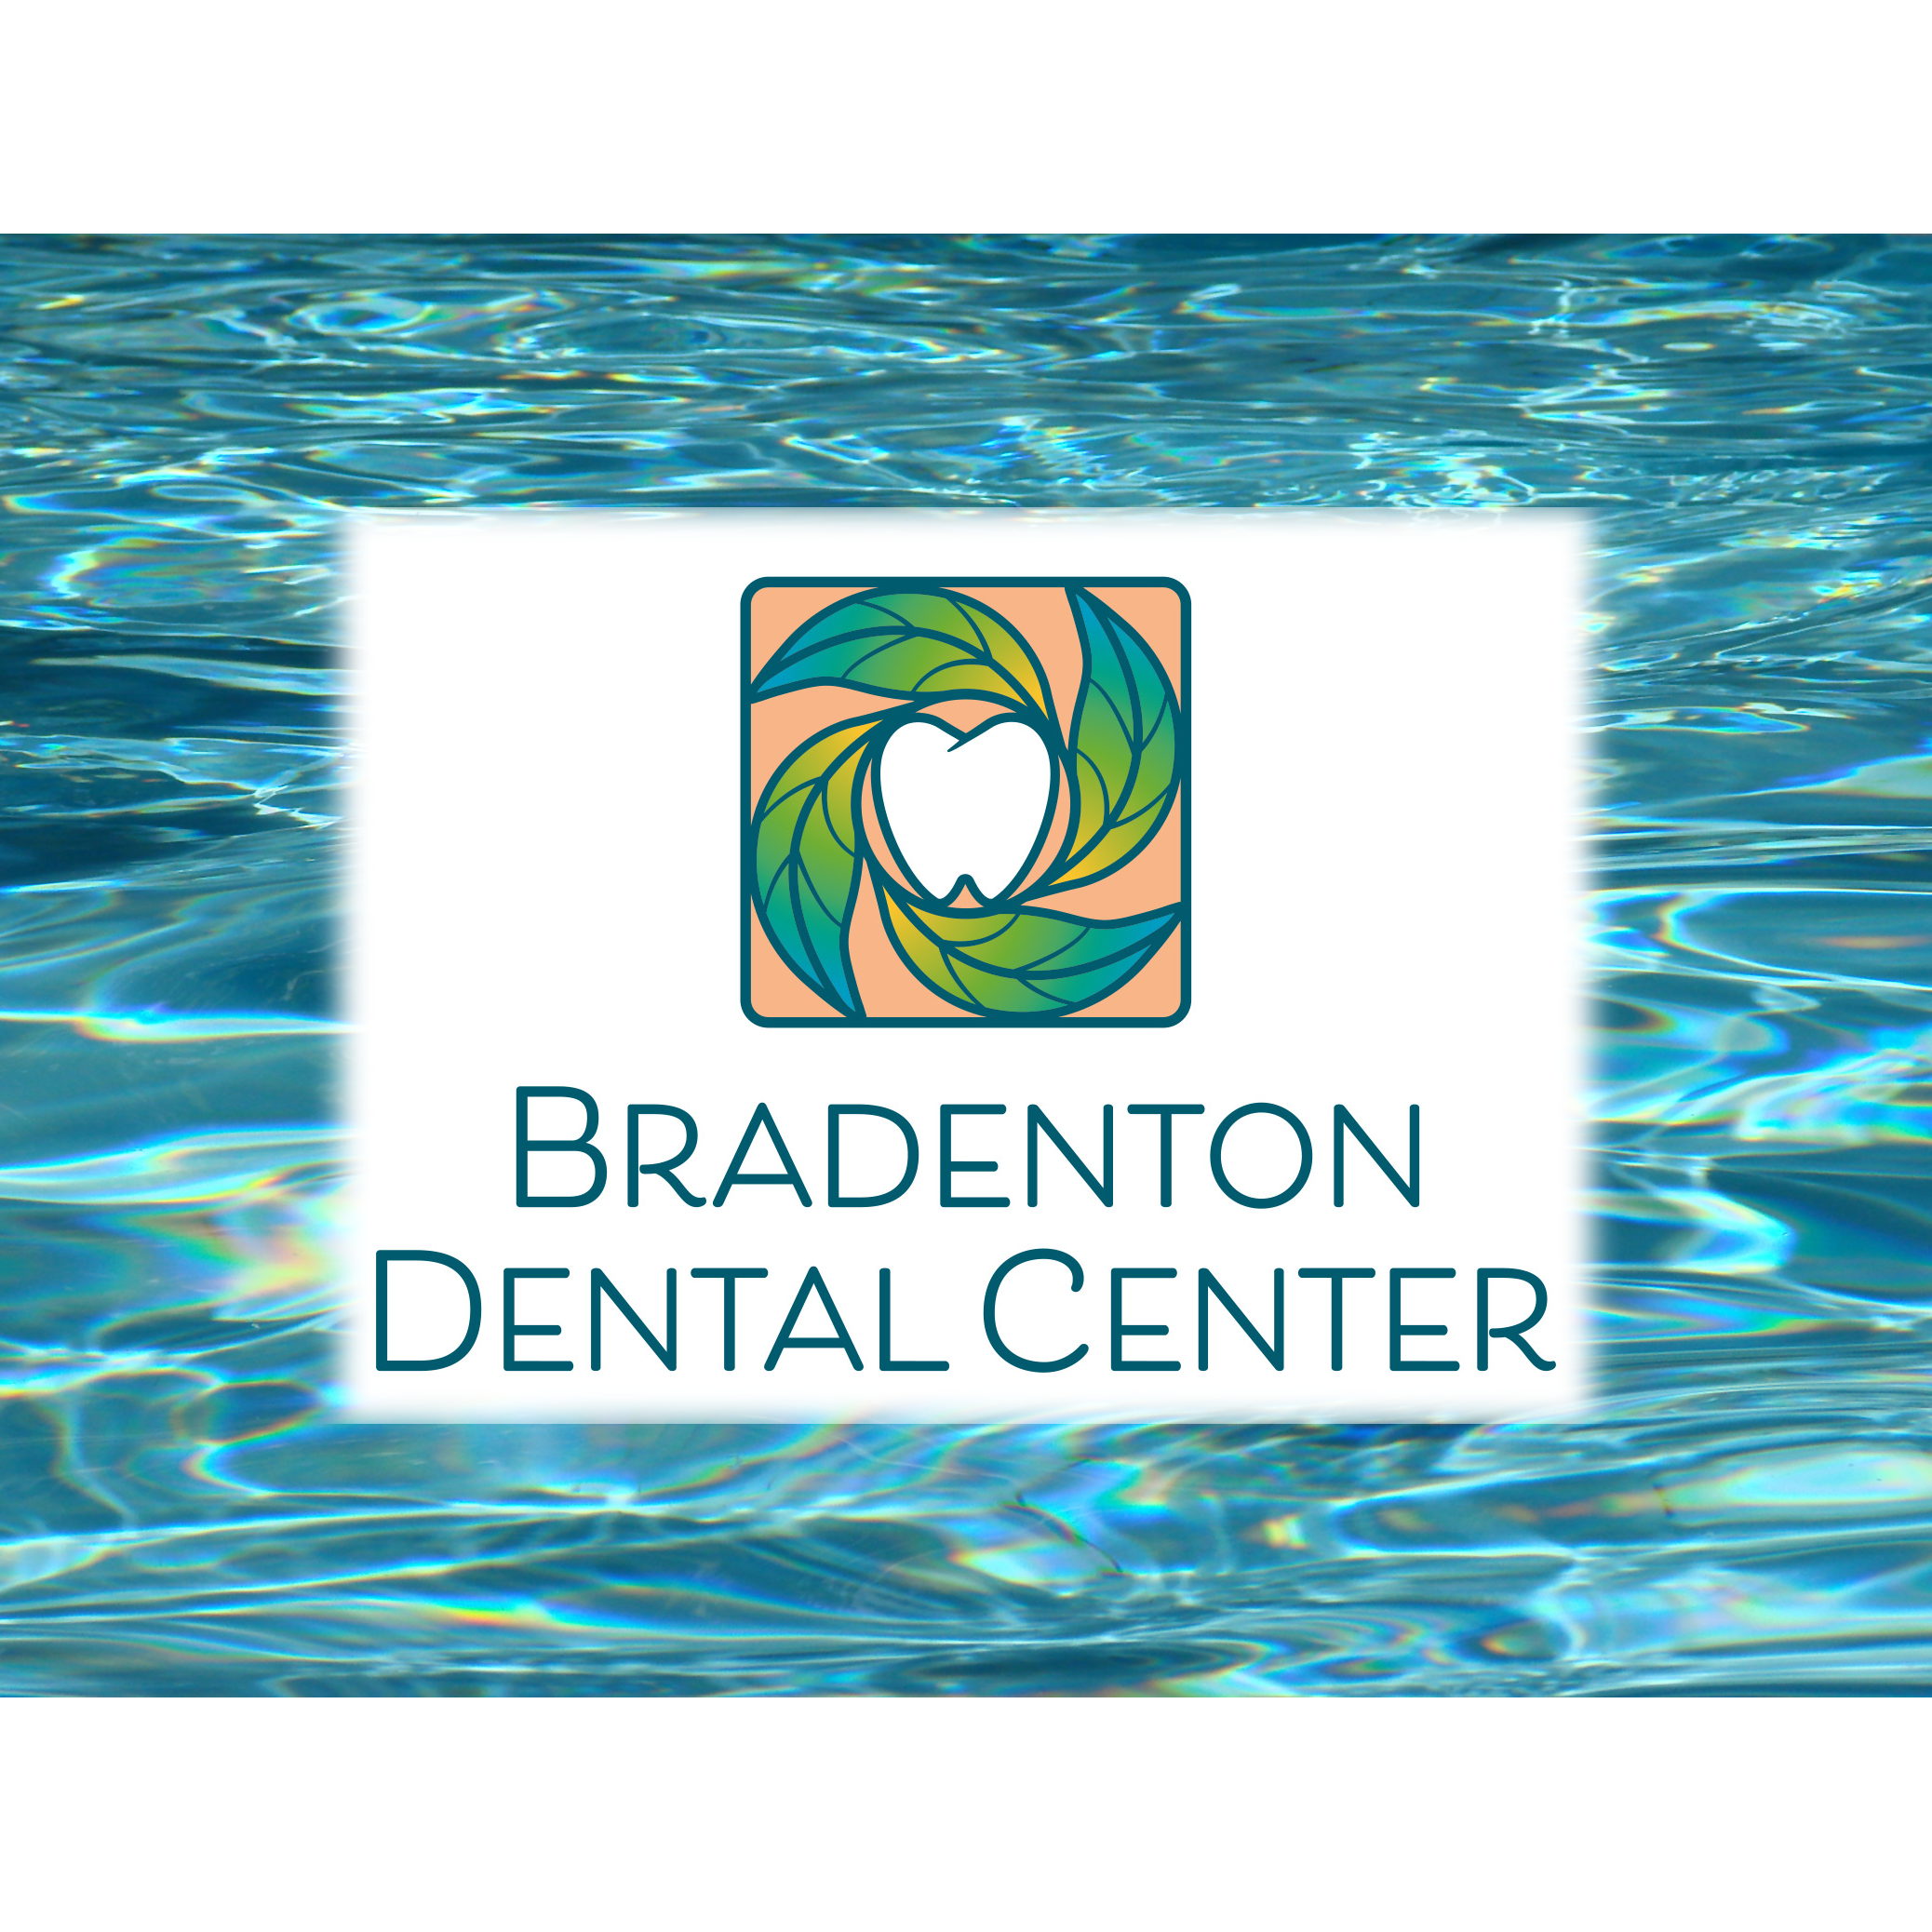 Bradenton Dental Center